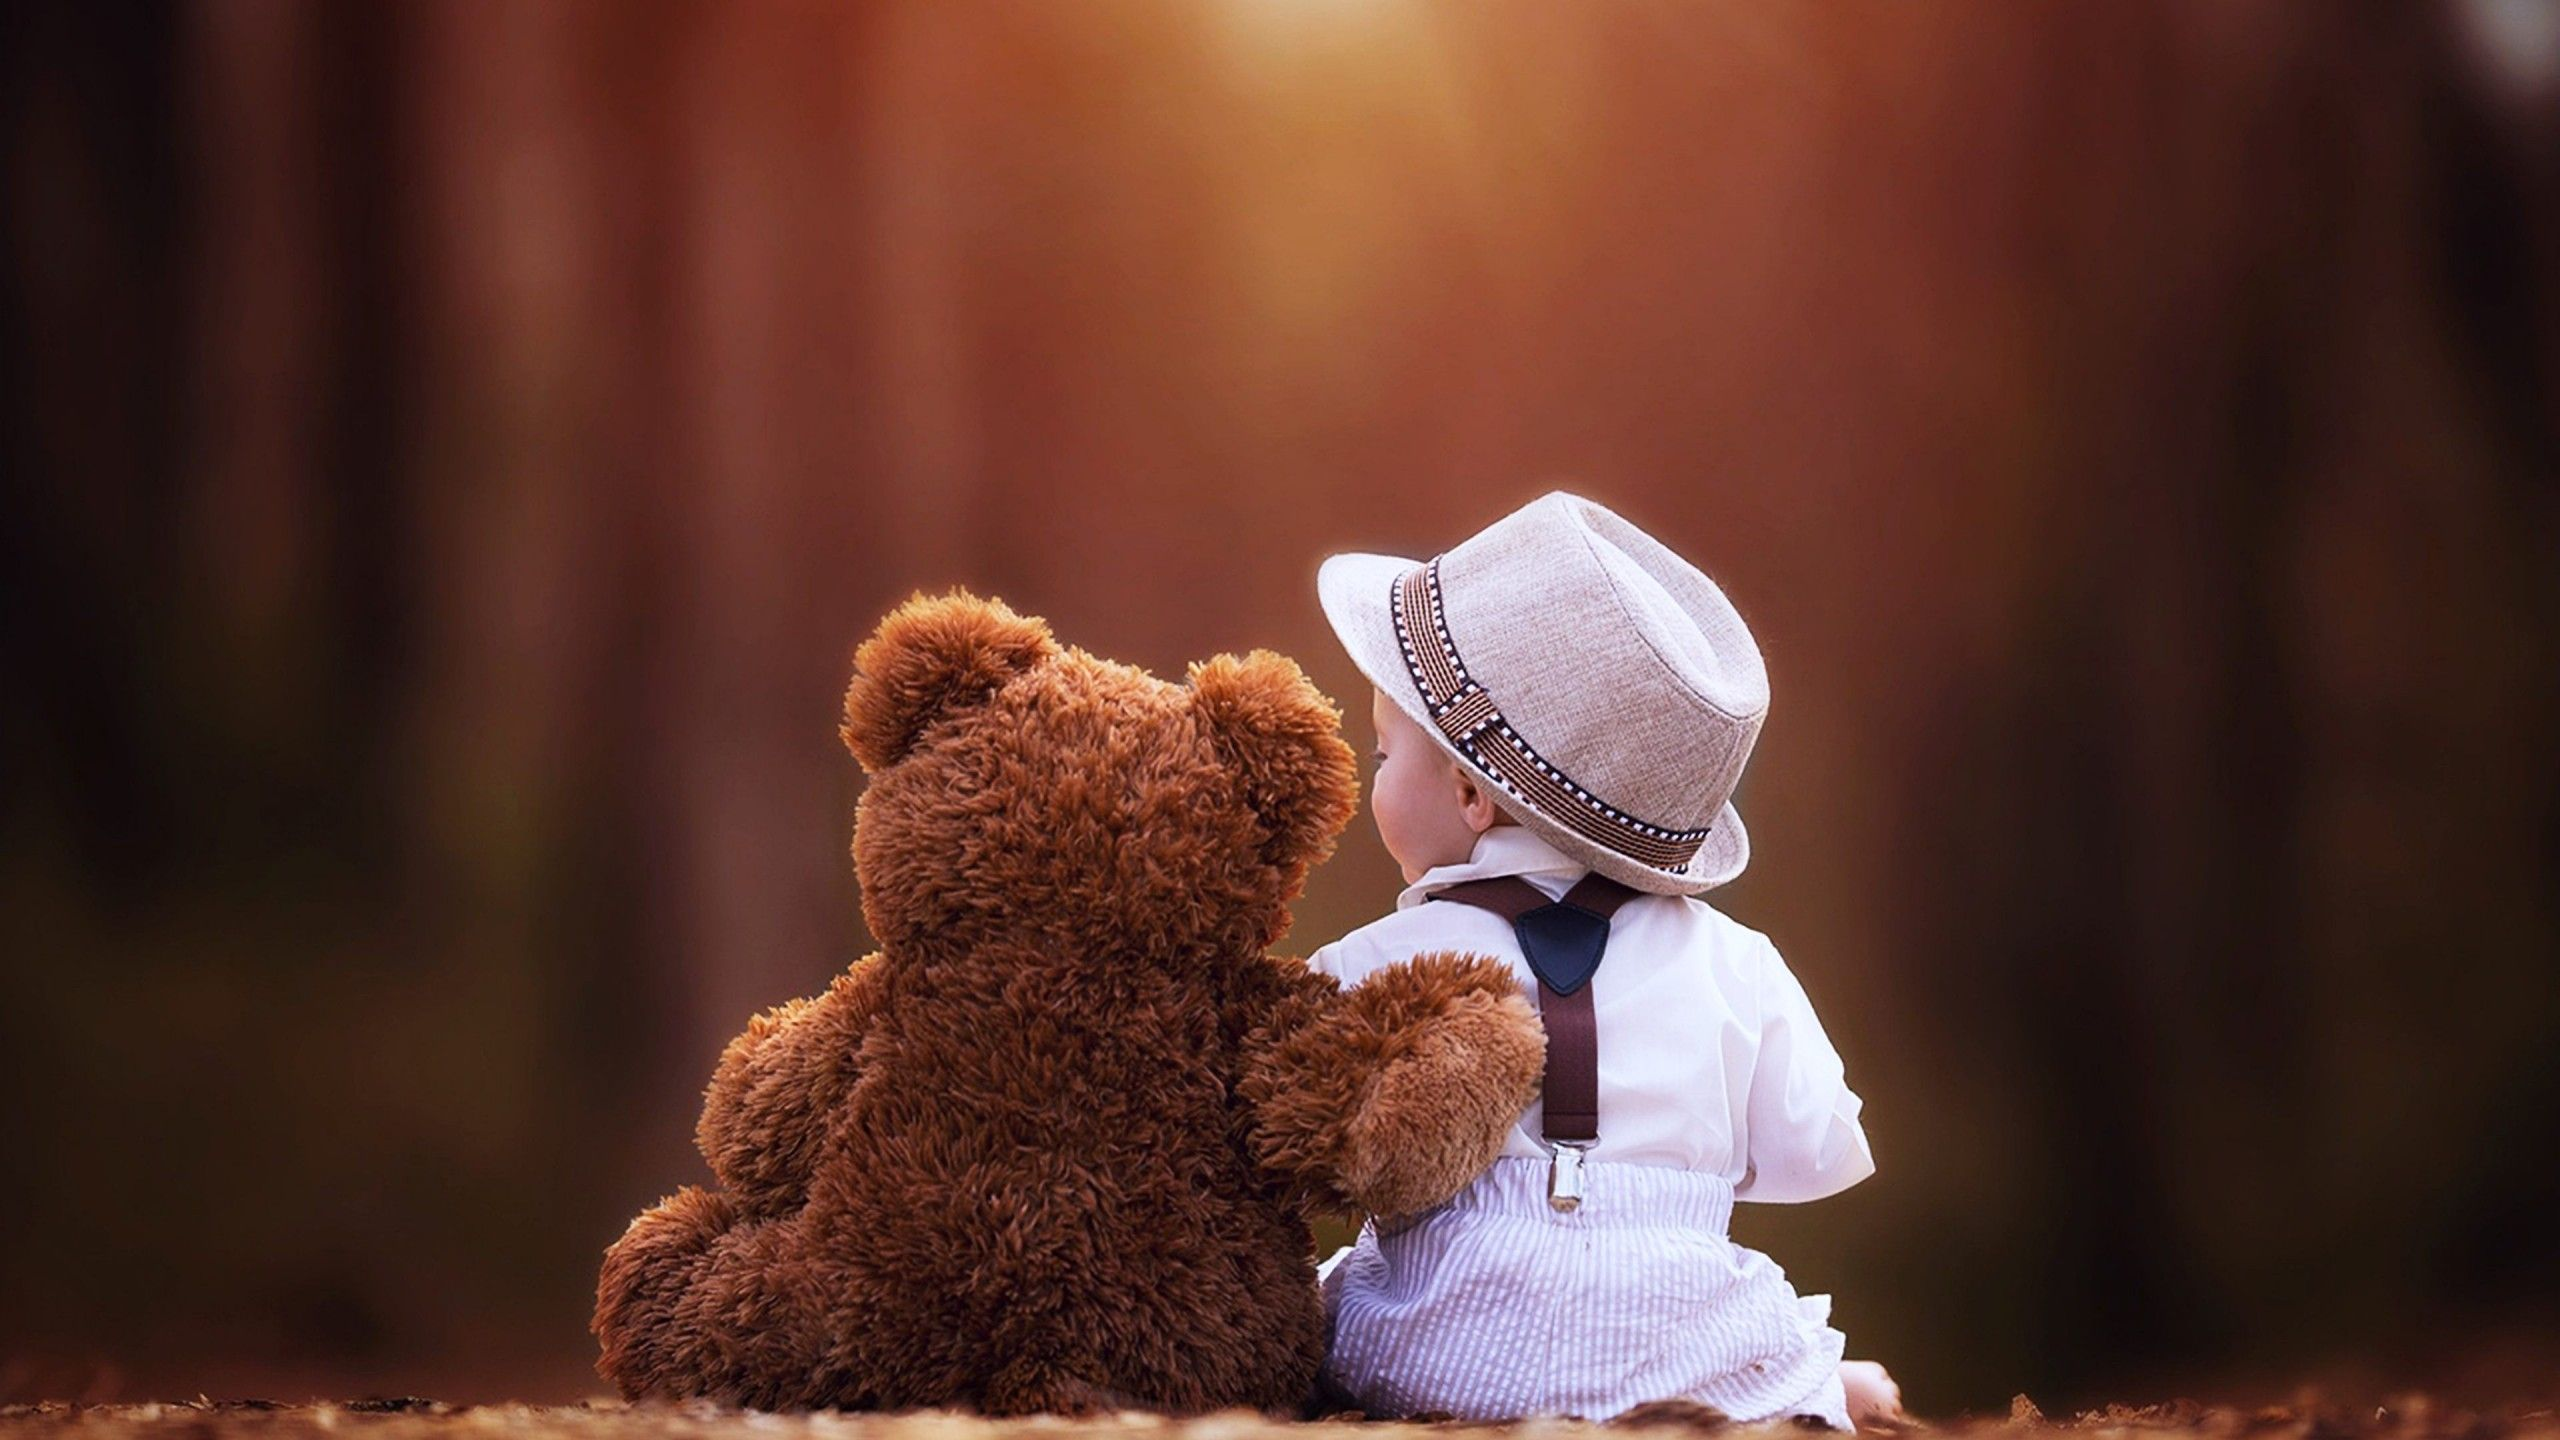 cute baby with teddy bear hd desktop wallpaper high definition